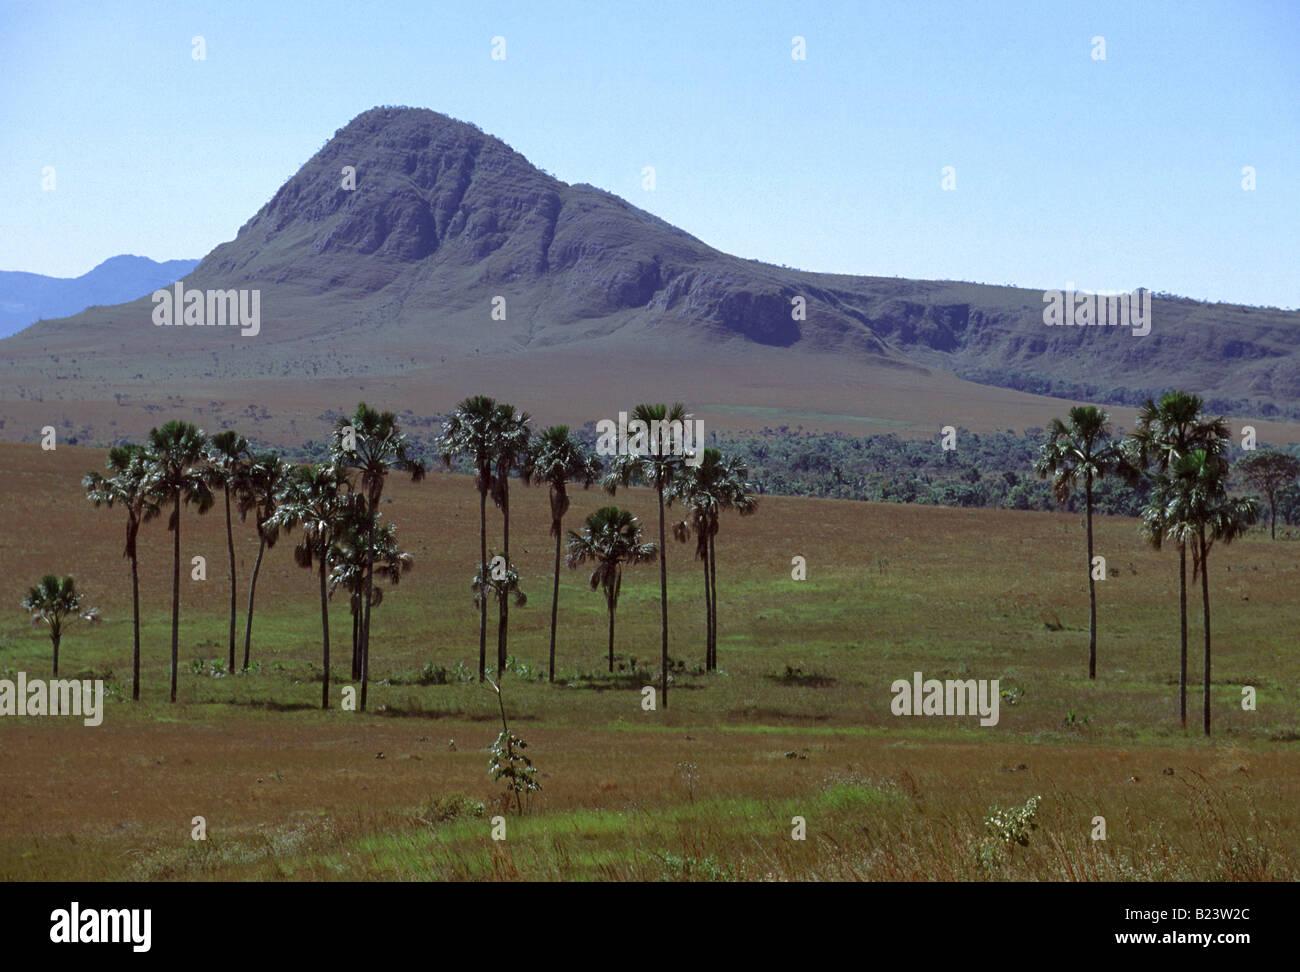 Landscape at Chapada dos Veadeiros, Brazil - Stock Image